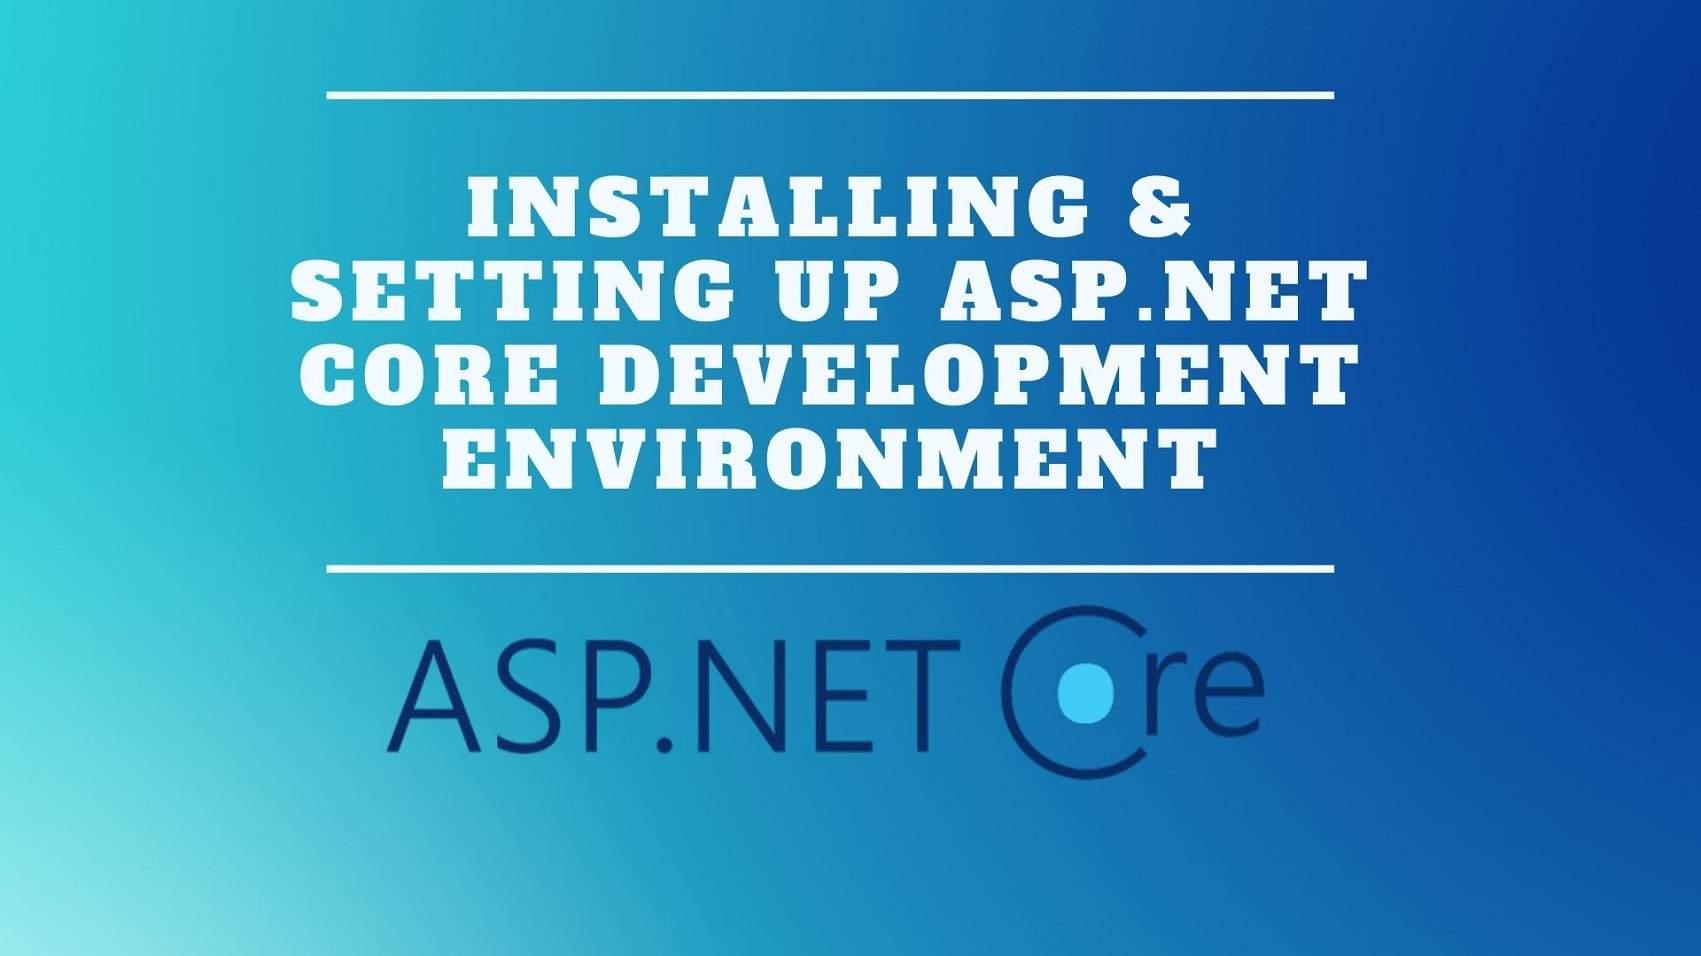 Installing & Setting Up ASP.NET Core Development Environment